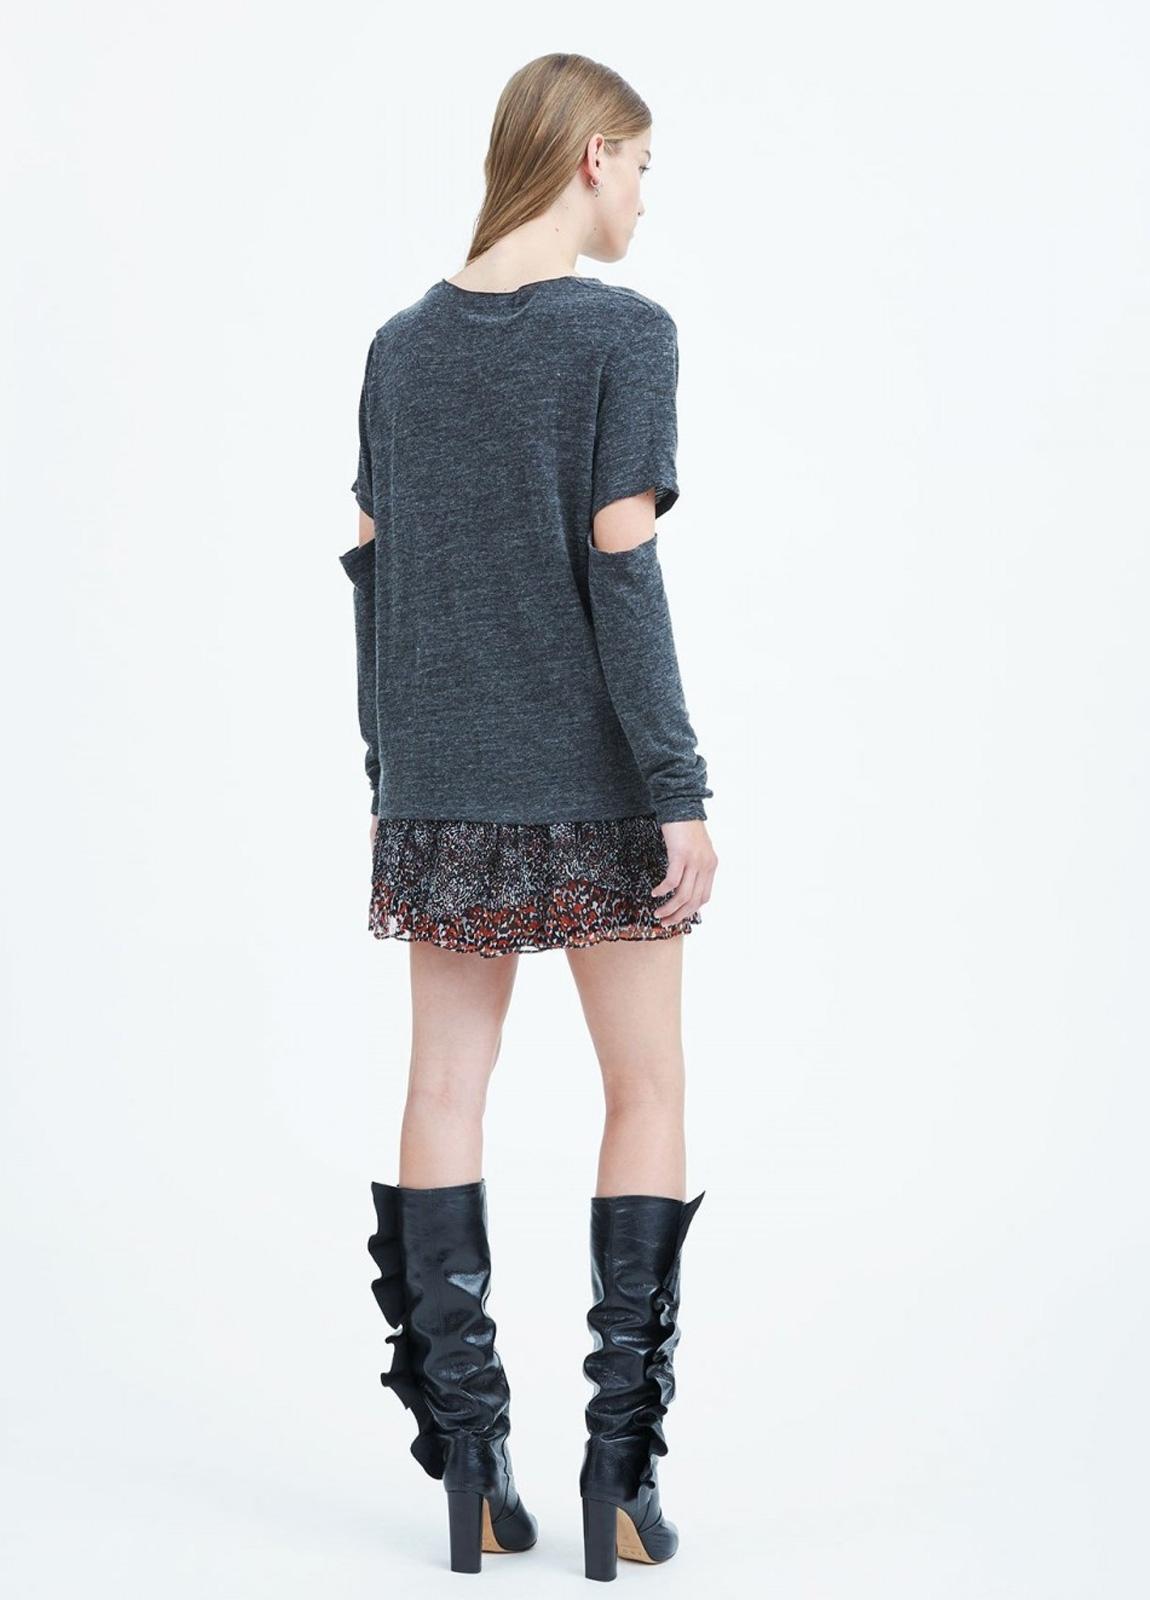 Camiseta woman manga larga color gris con abertura en codos. 63% Viscosa 28% Lana 9% Poliamida. - Ítem2